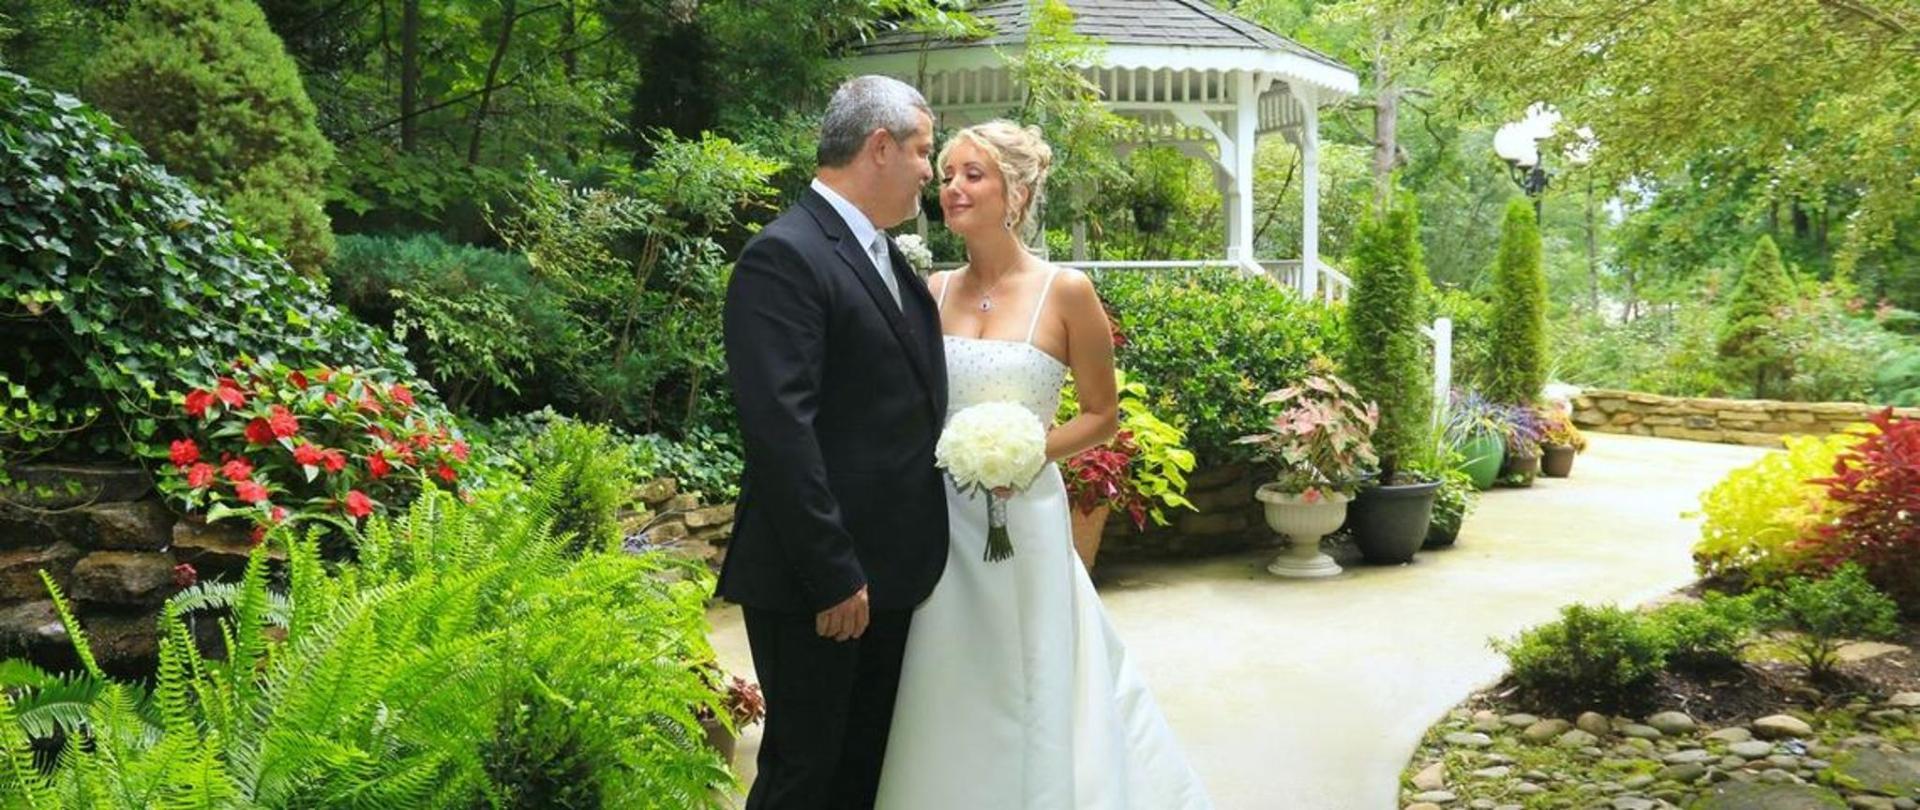 chapel-at-the-park-garden-couple.jpg.1140x481_0_99_5937.jpg